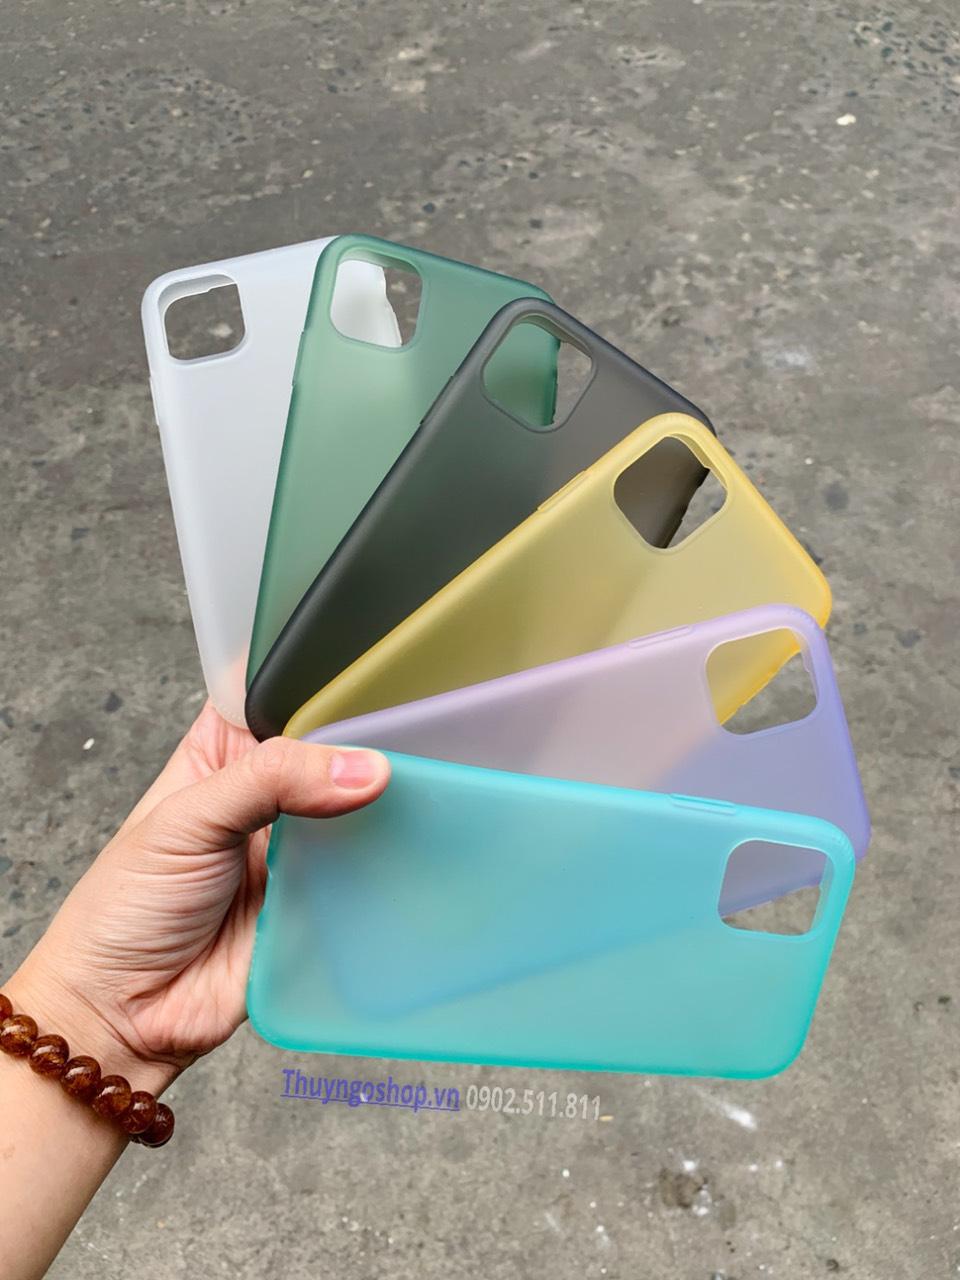 Ốp cao su non - siêu dẻo - siêu mềm màu trong nhám Iphone 11 - iphone 11 pro - iphone 11 pro max